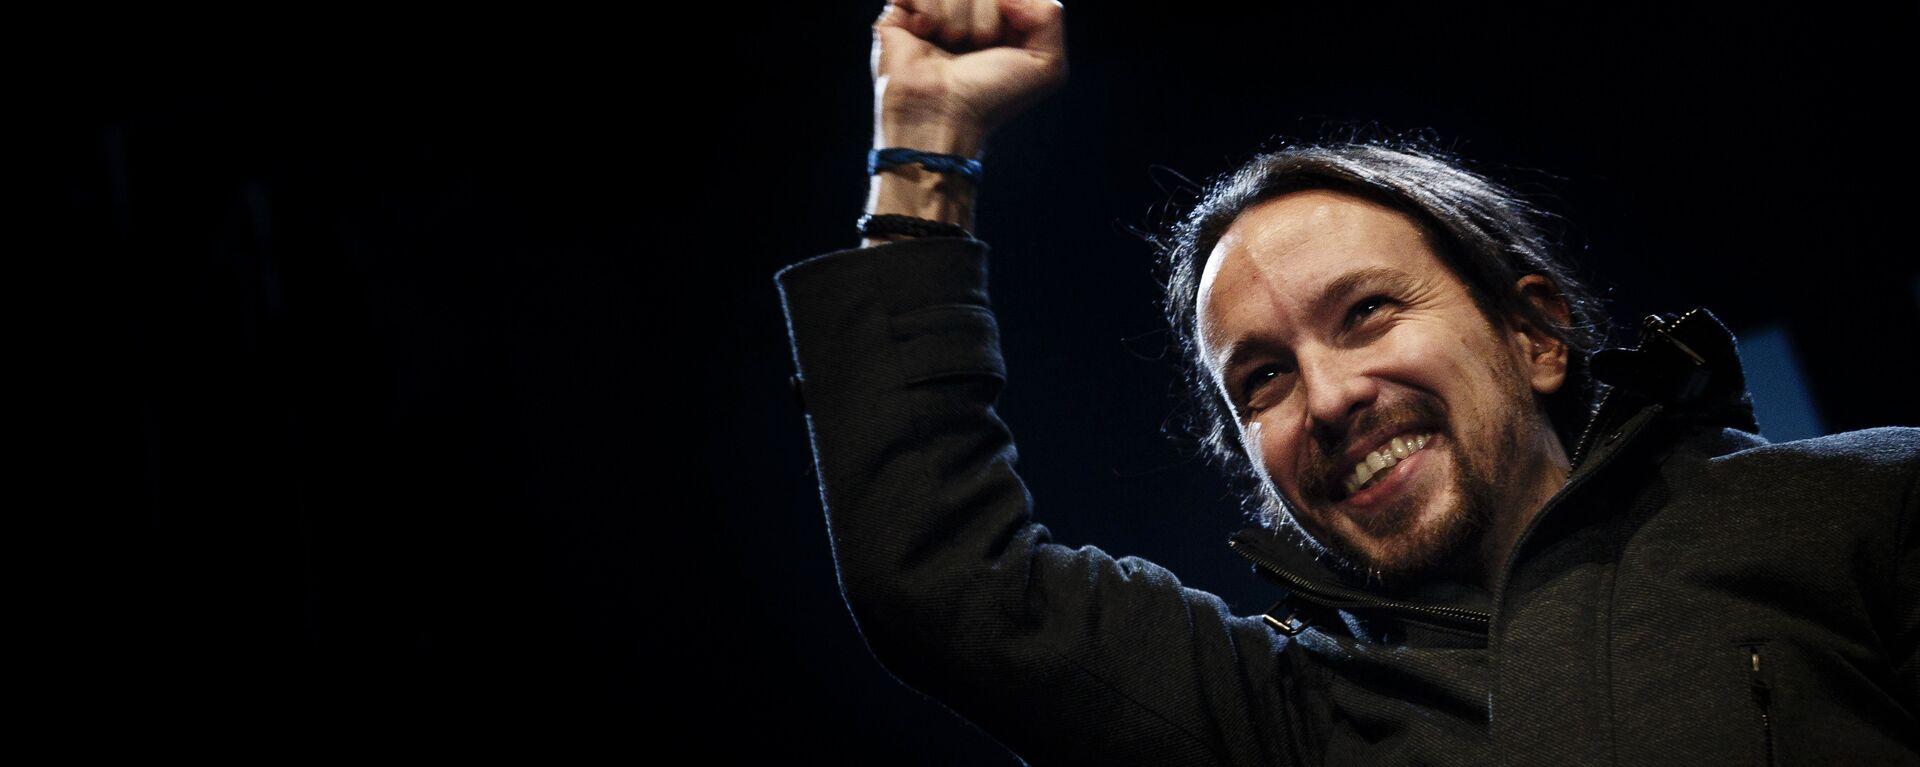 Pablo Iglesias, líder del partido de izquierda Podemos  - Sputnik Mundo, 1920, 22.04.2021